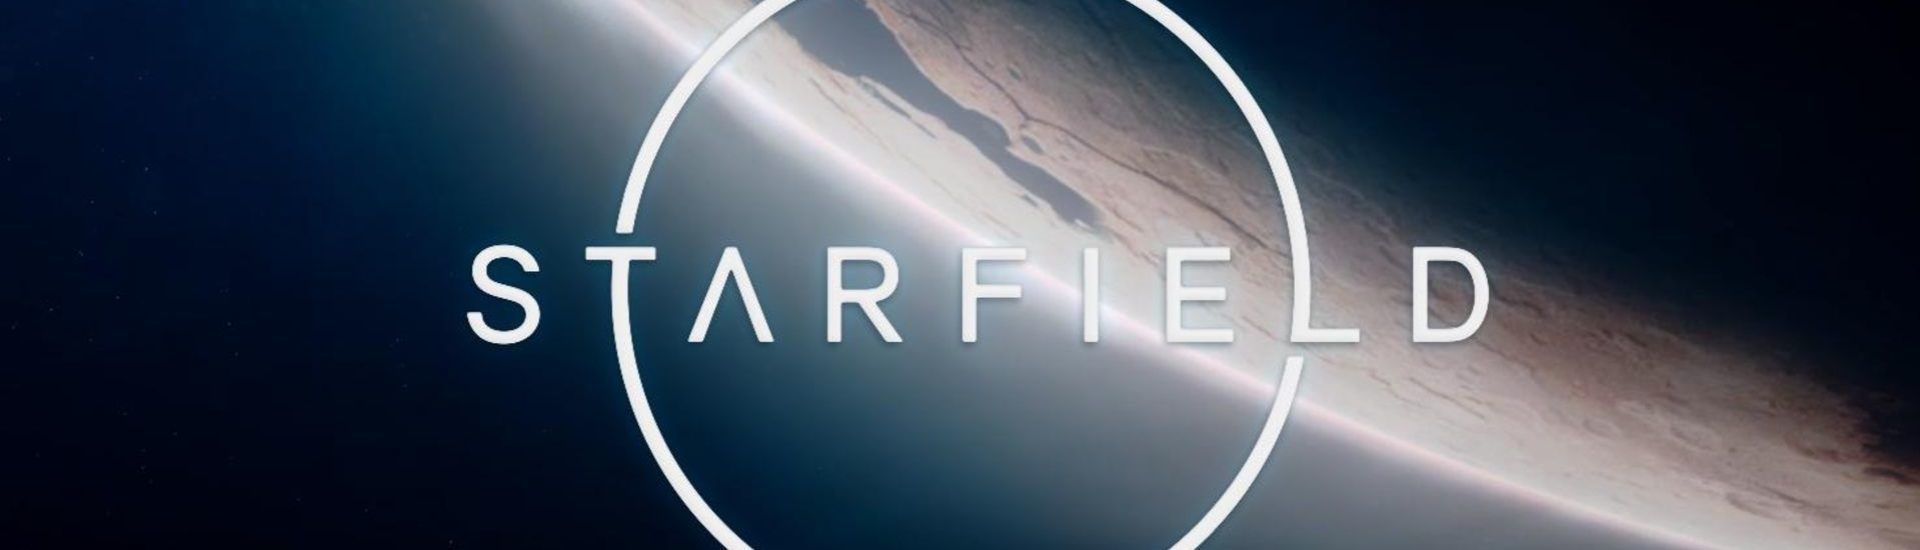 Starfield: Laut Insider 100 Prozent Xbox-Exclusive